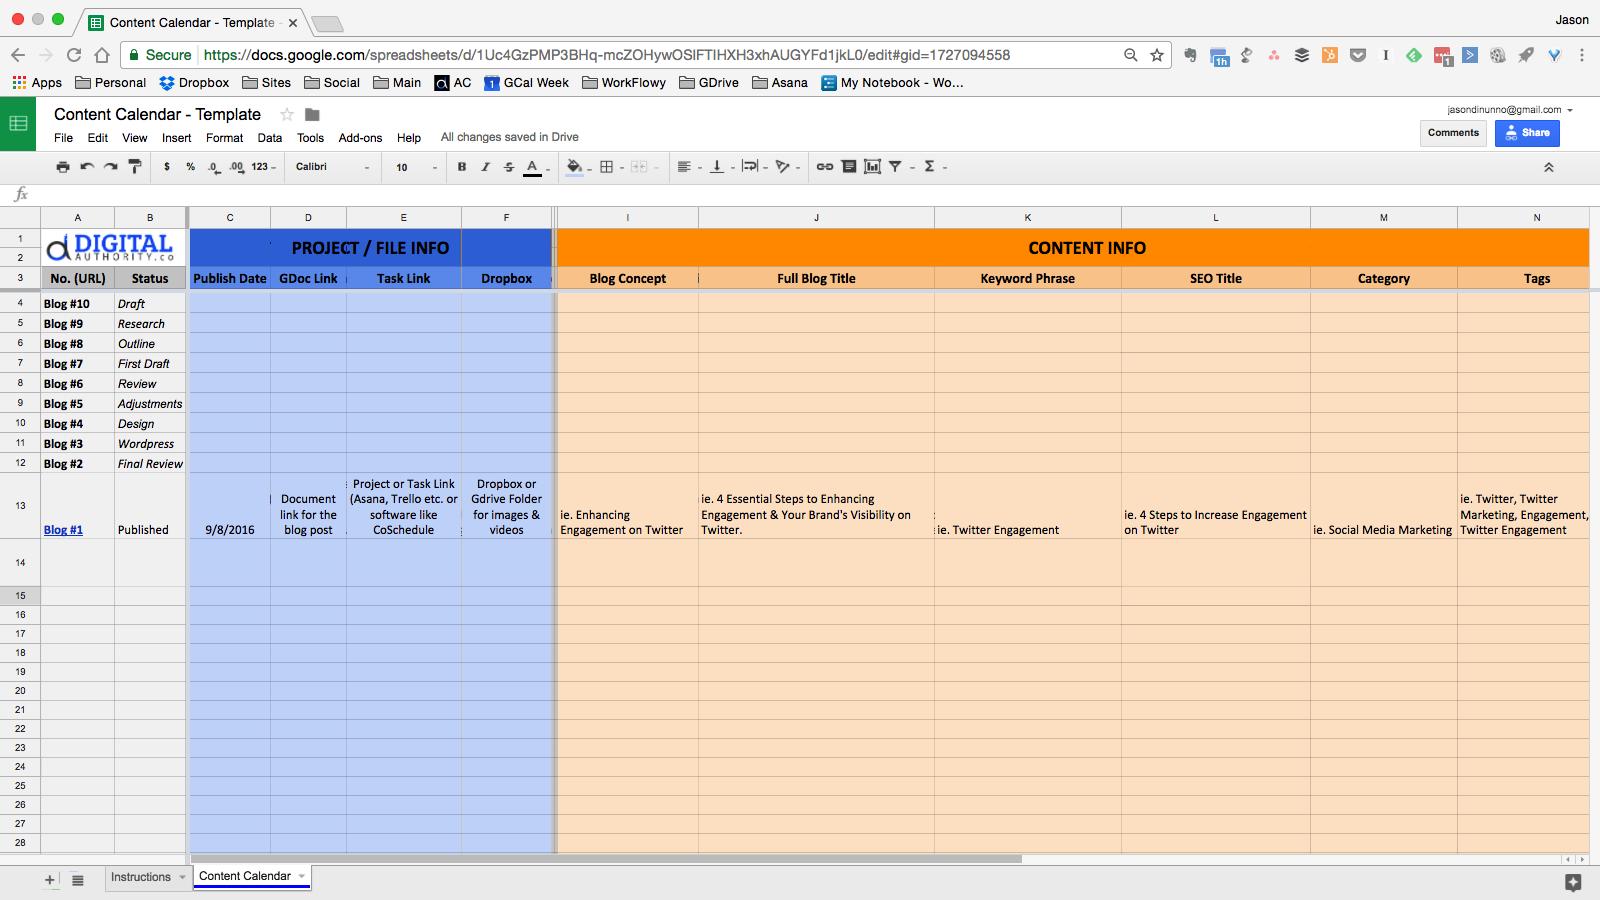 Content Calendar - Upgrade Screenshot